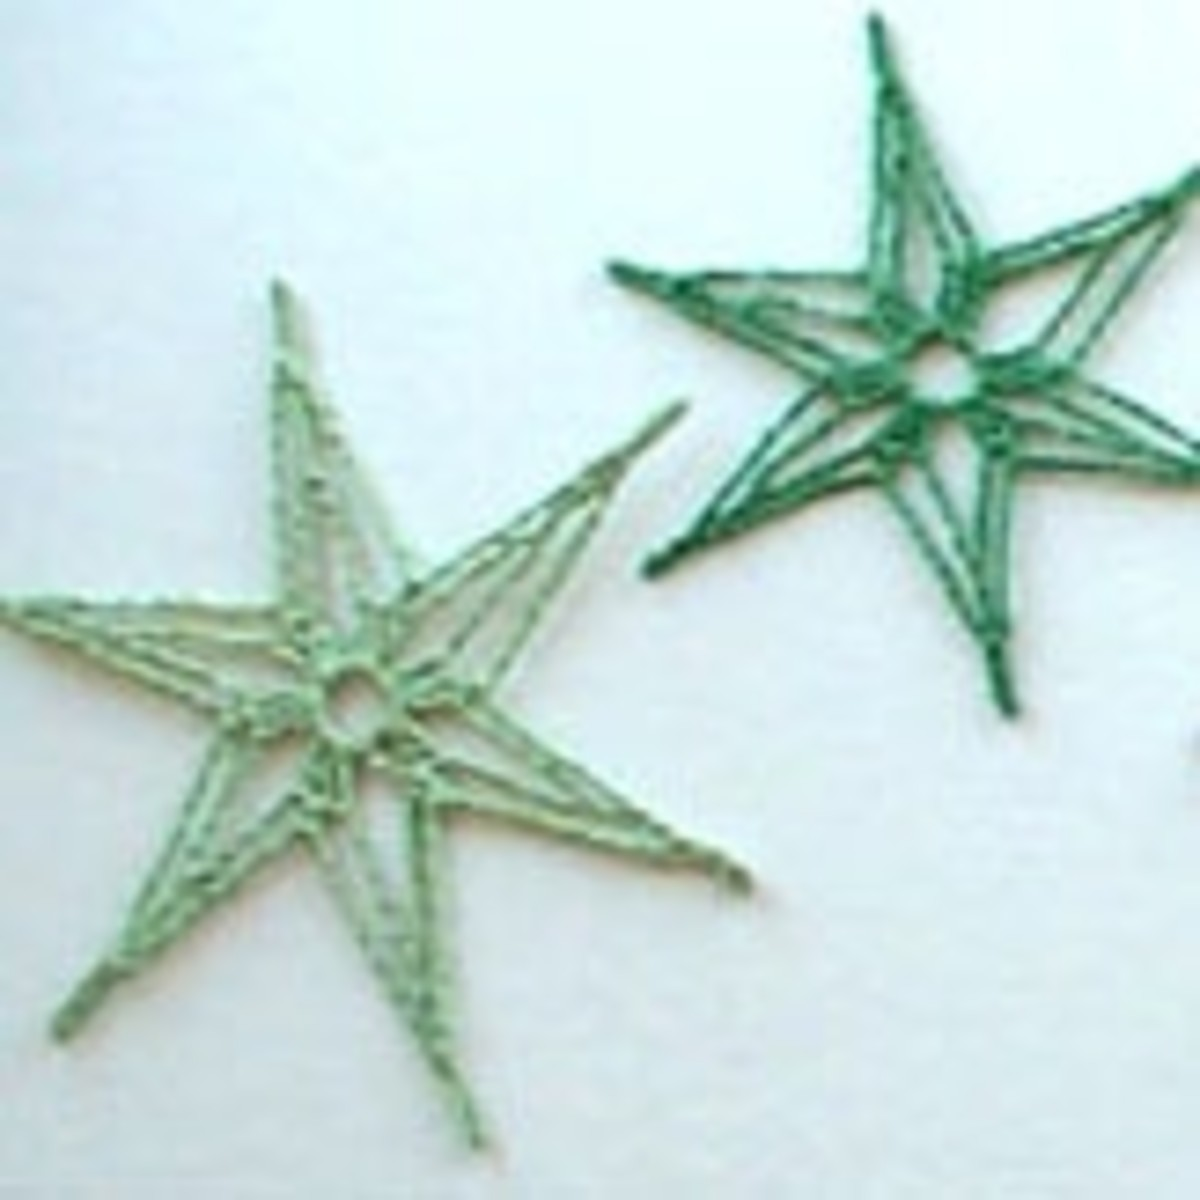 6 point crochet snowflakes photo by Mona Majorowicz